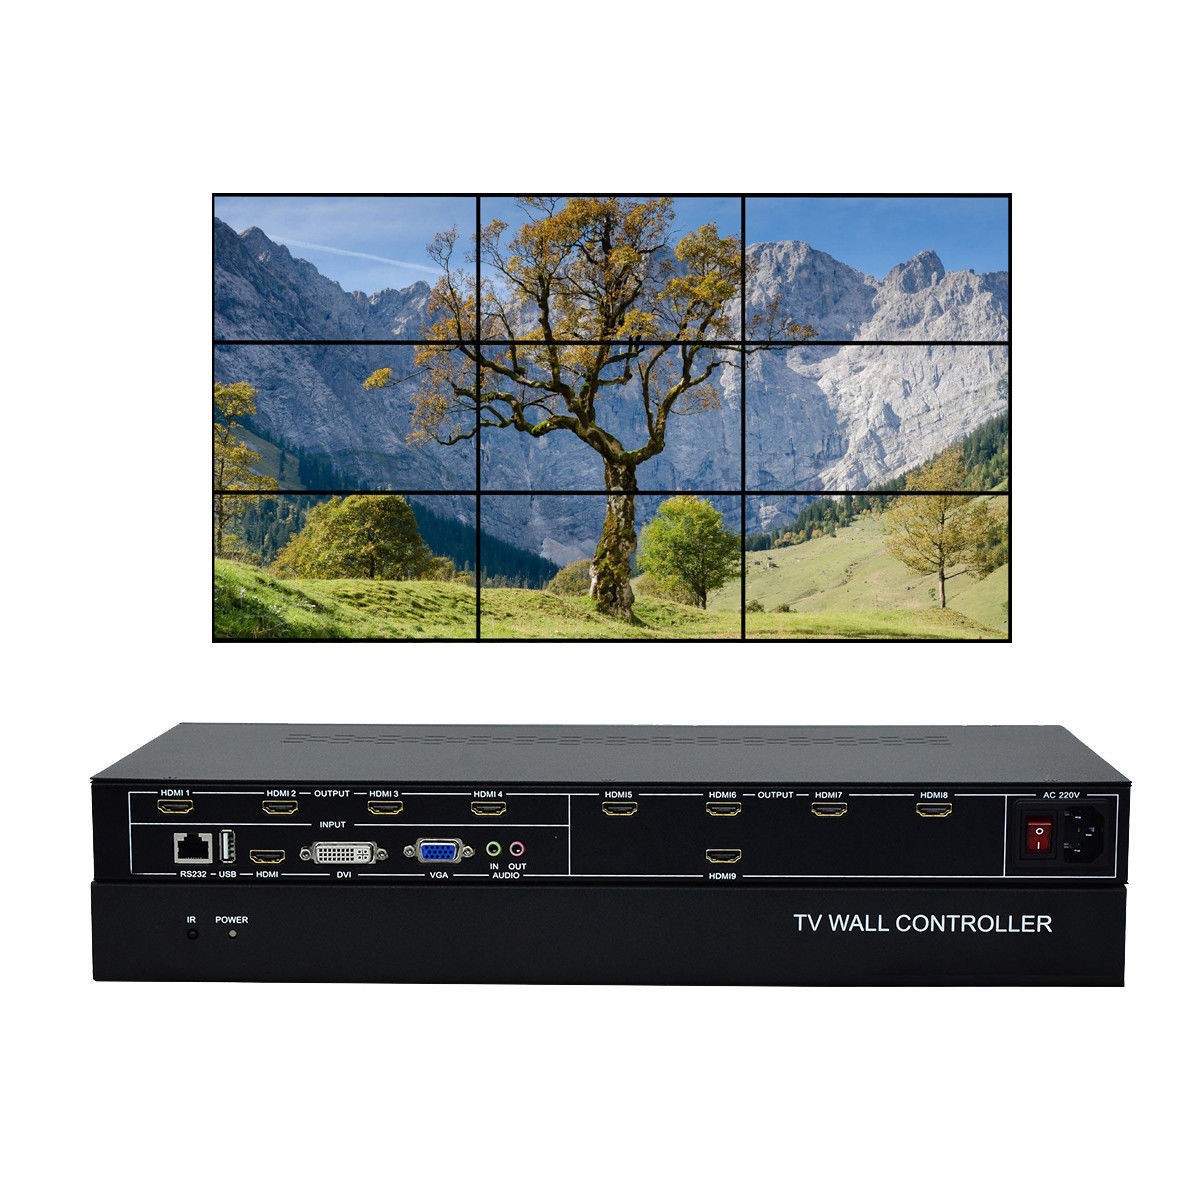 все цены на ESZYM 9 Channel TV Video Wall Controller 3x3 2x4 4x2 HDMI DVI VGA USB Video Processor